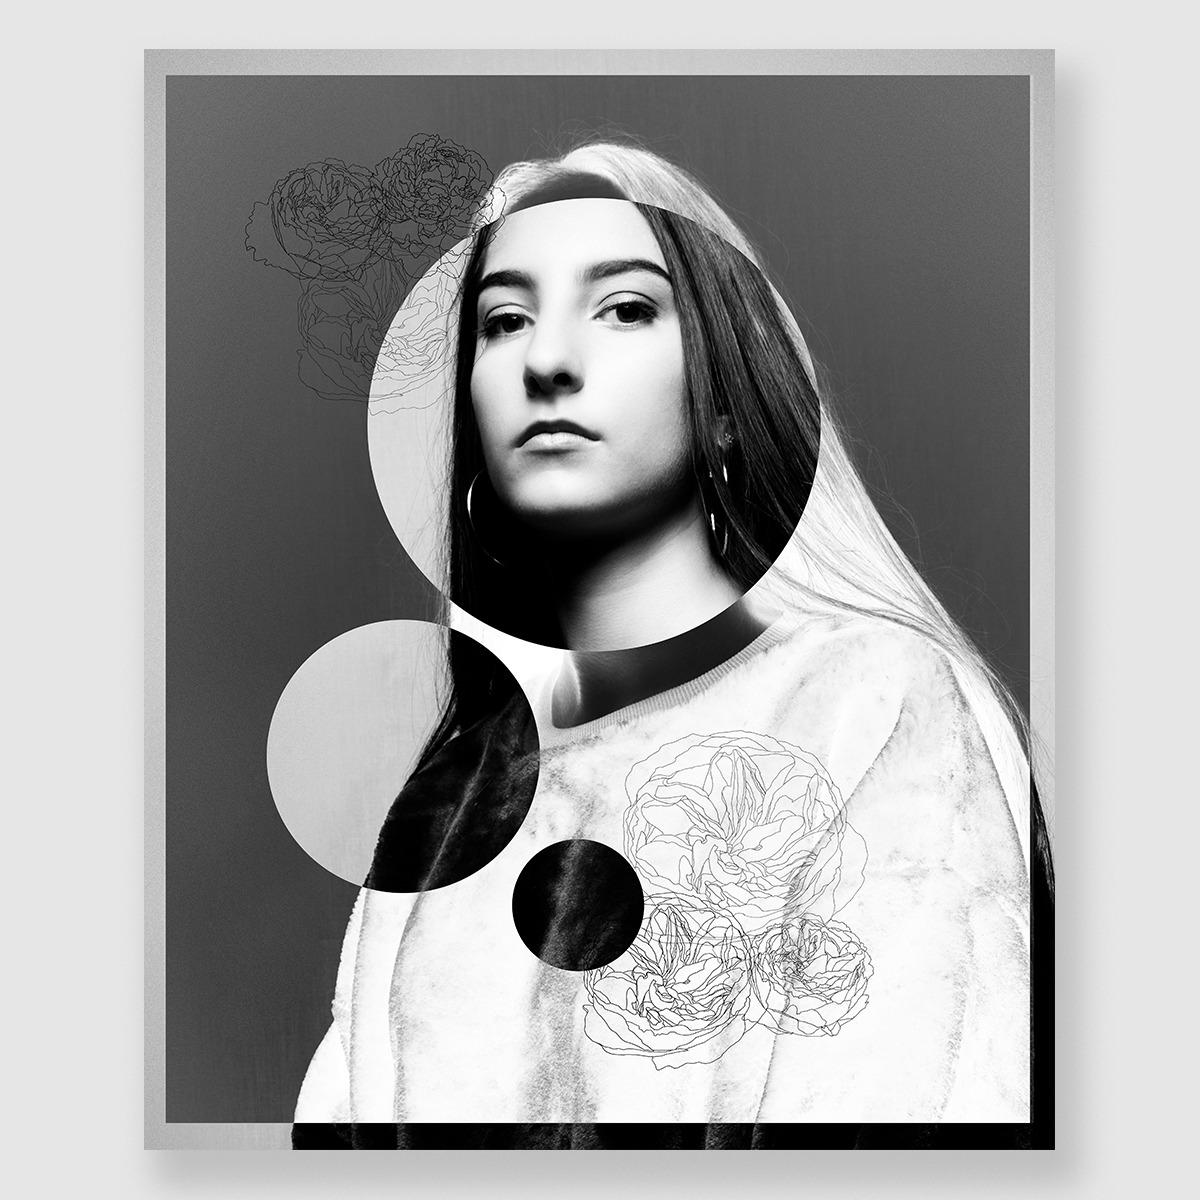 Verve Portraits    Digital Illustration Portrait, 2018    Original photo by Luca Prodigo.